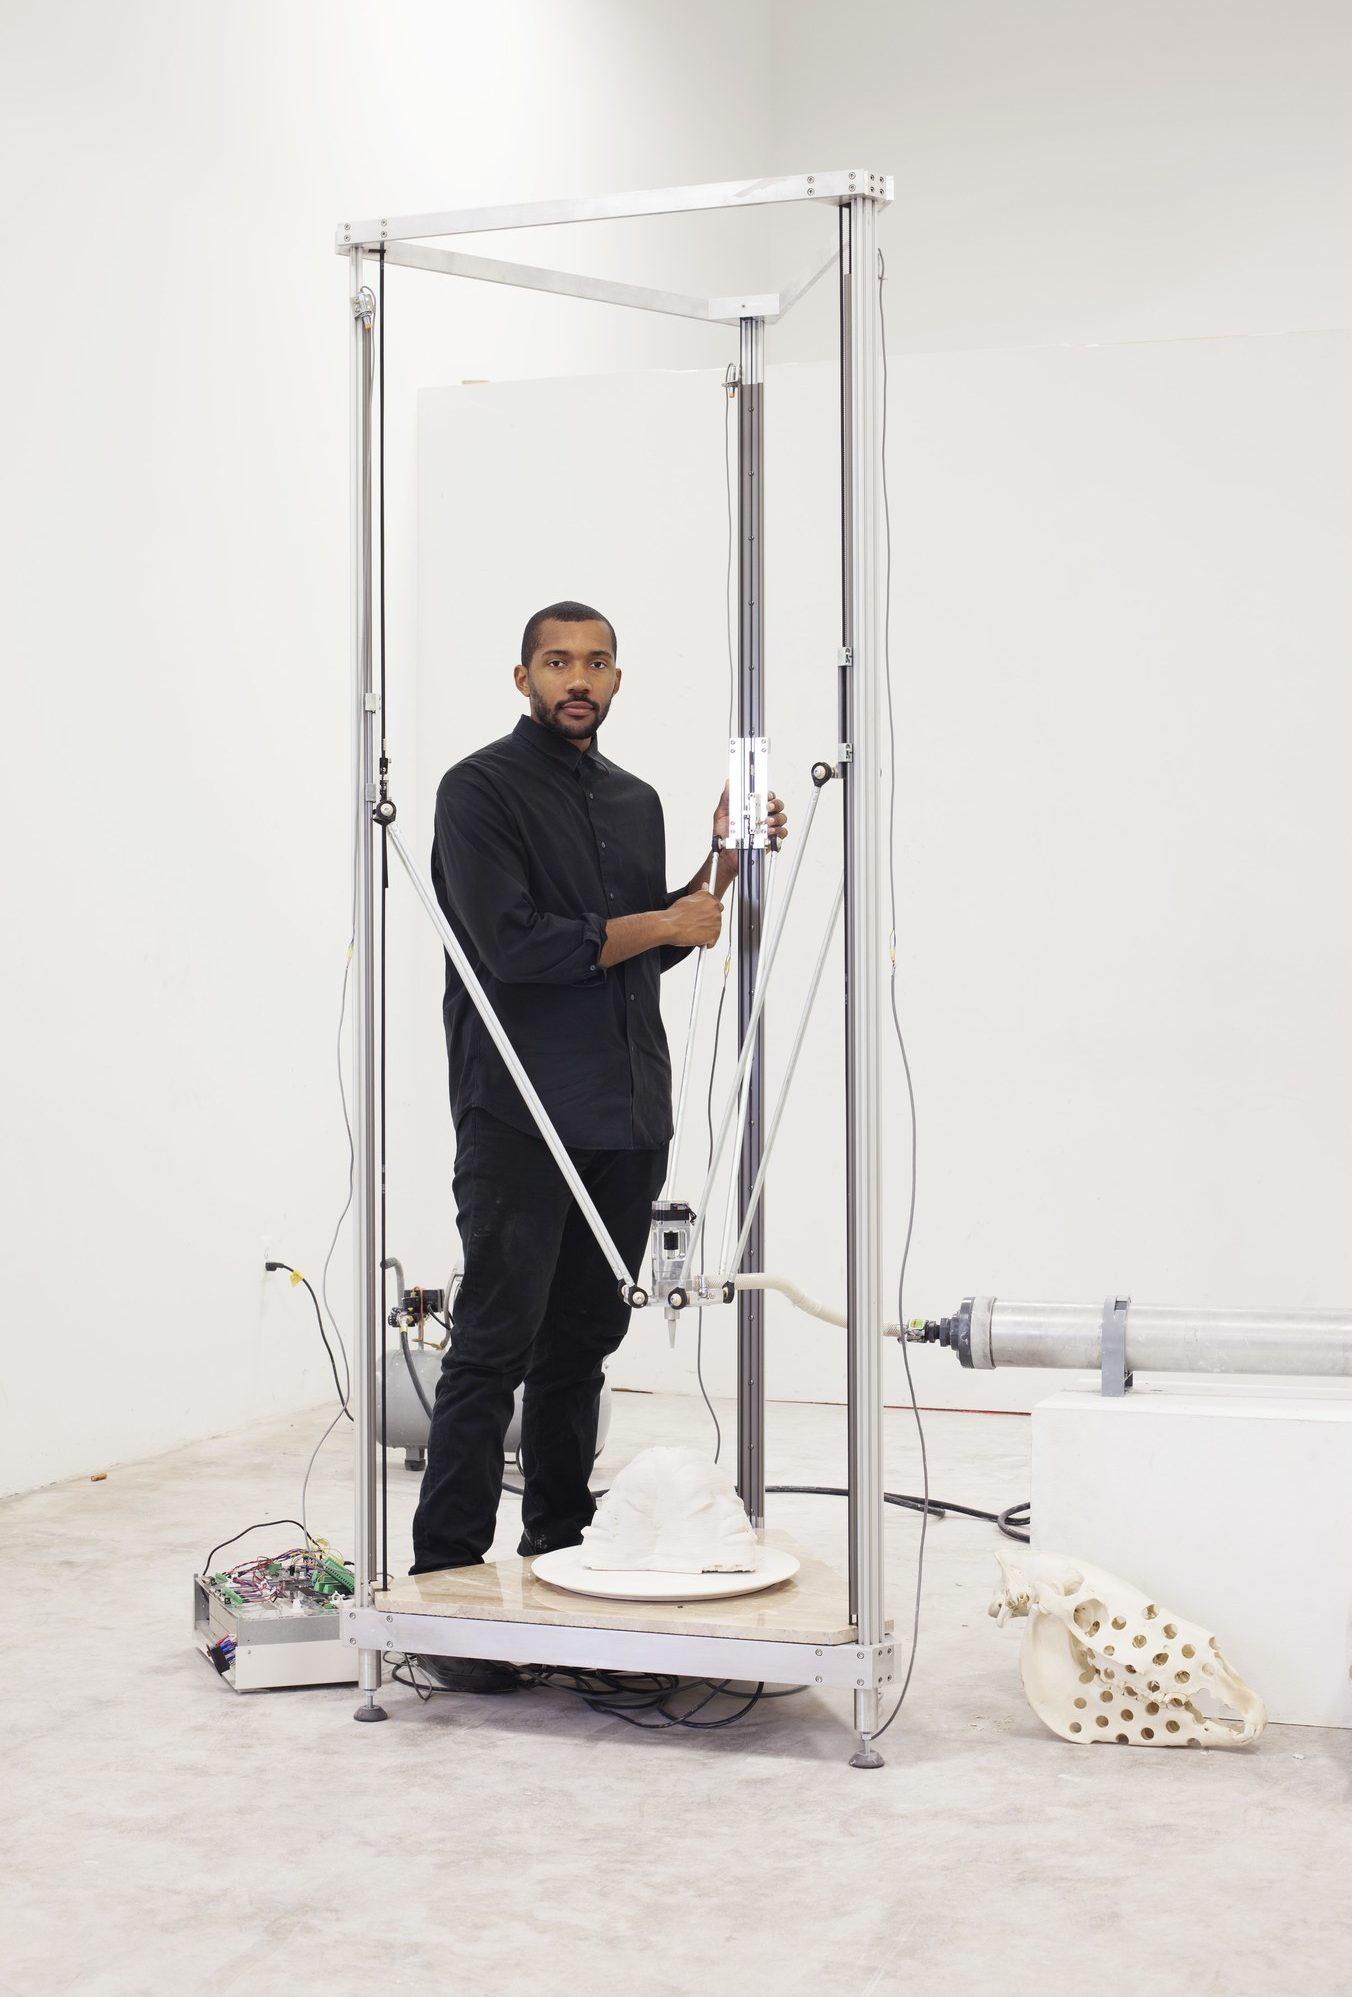 Matthew Angelo Harrison, in his Detroit studio. Photograph by Corine Vermeulen for W Magazine.